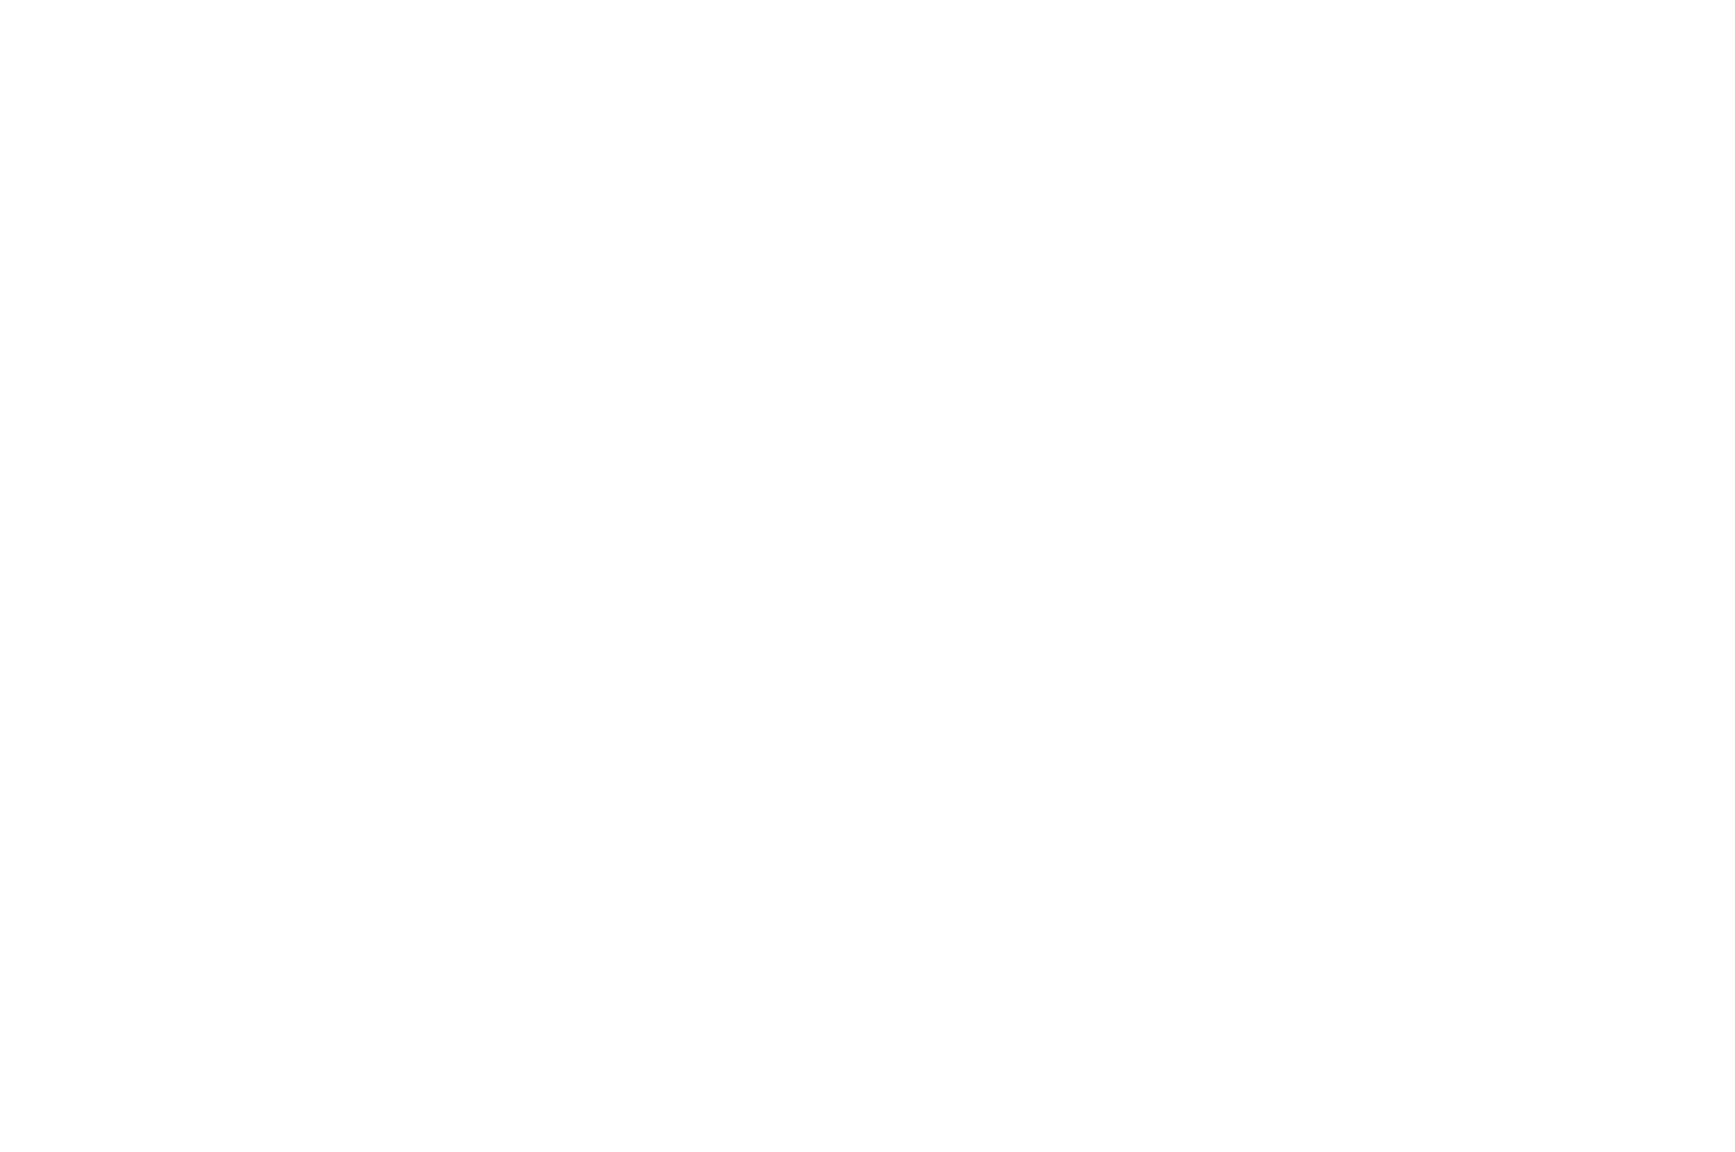 SEMI-FINALIST - Bare Bones Intl Film Festival Screenplay Competition